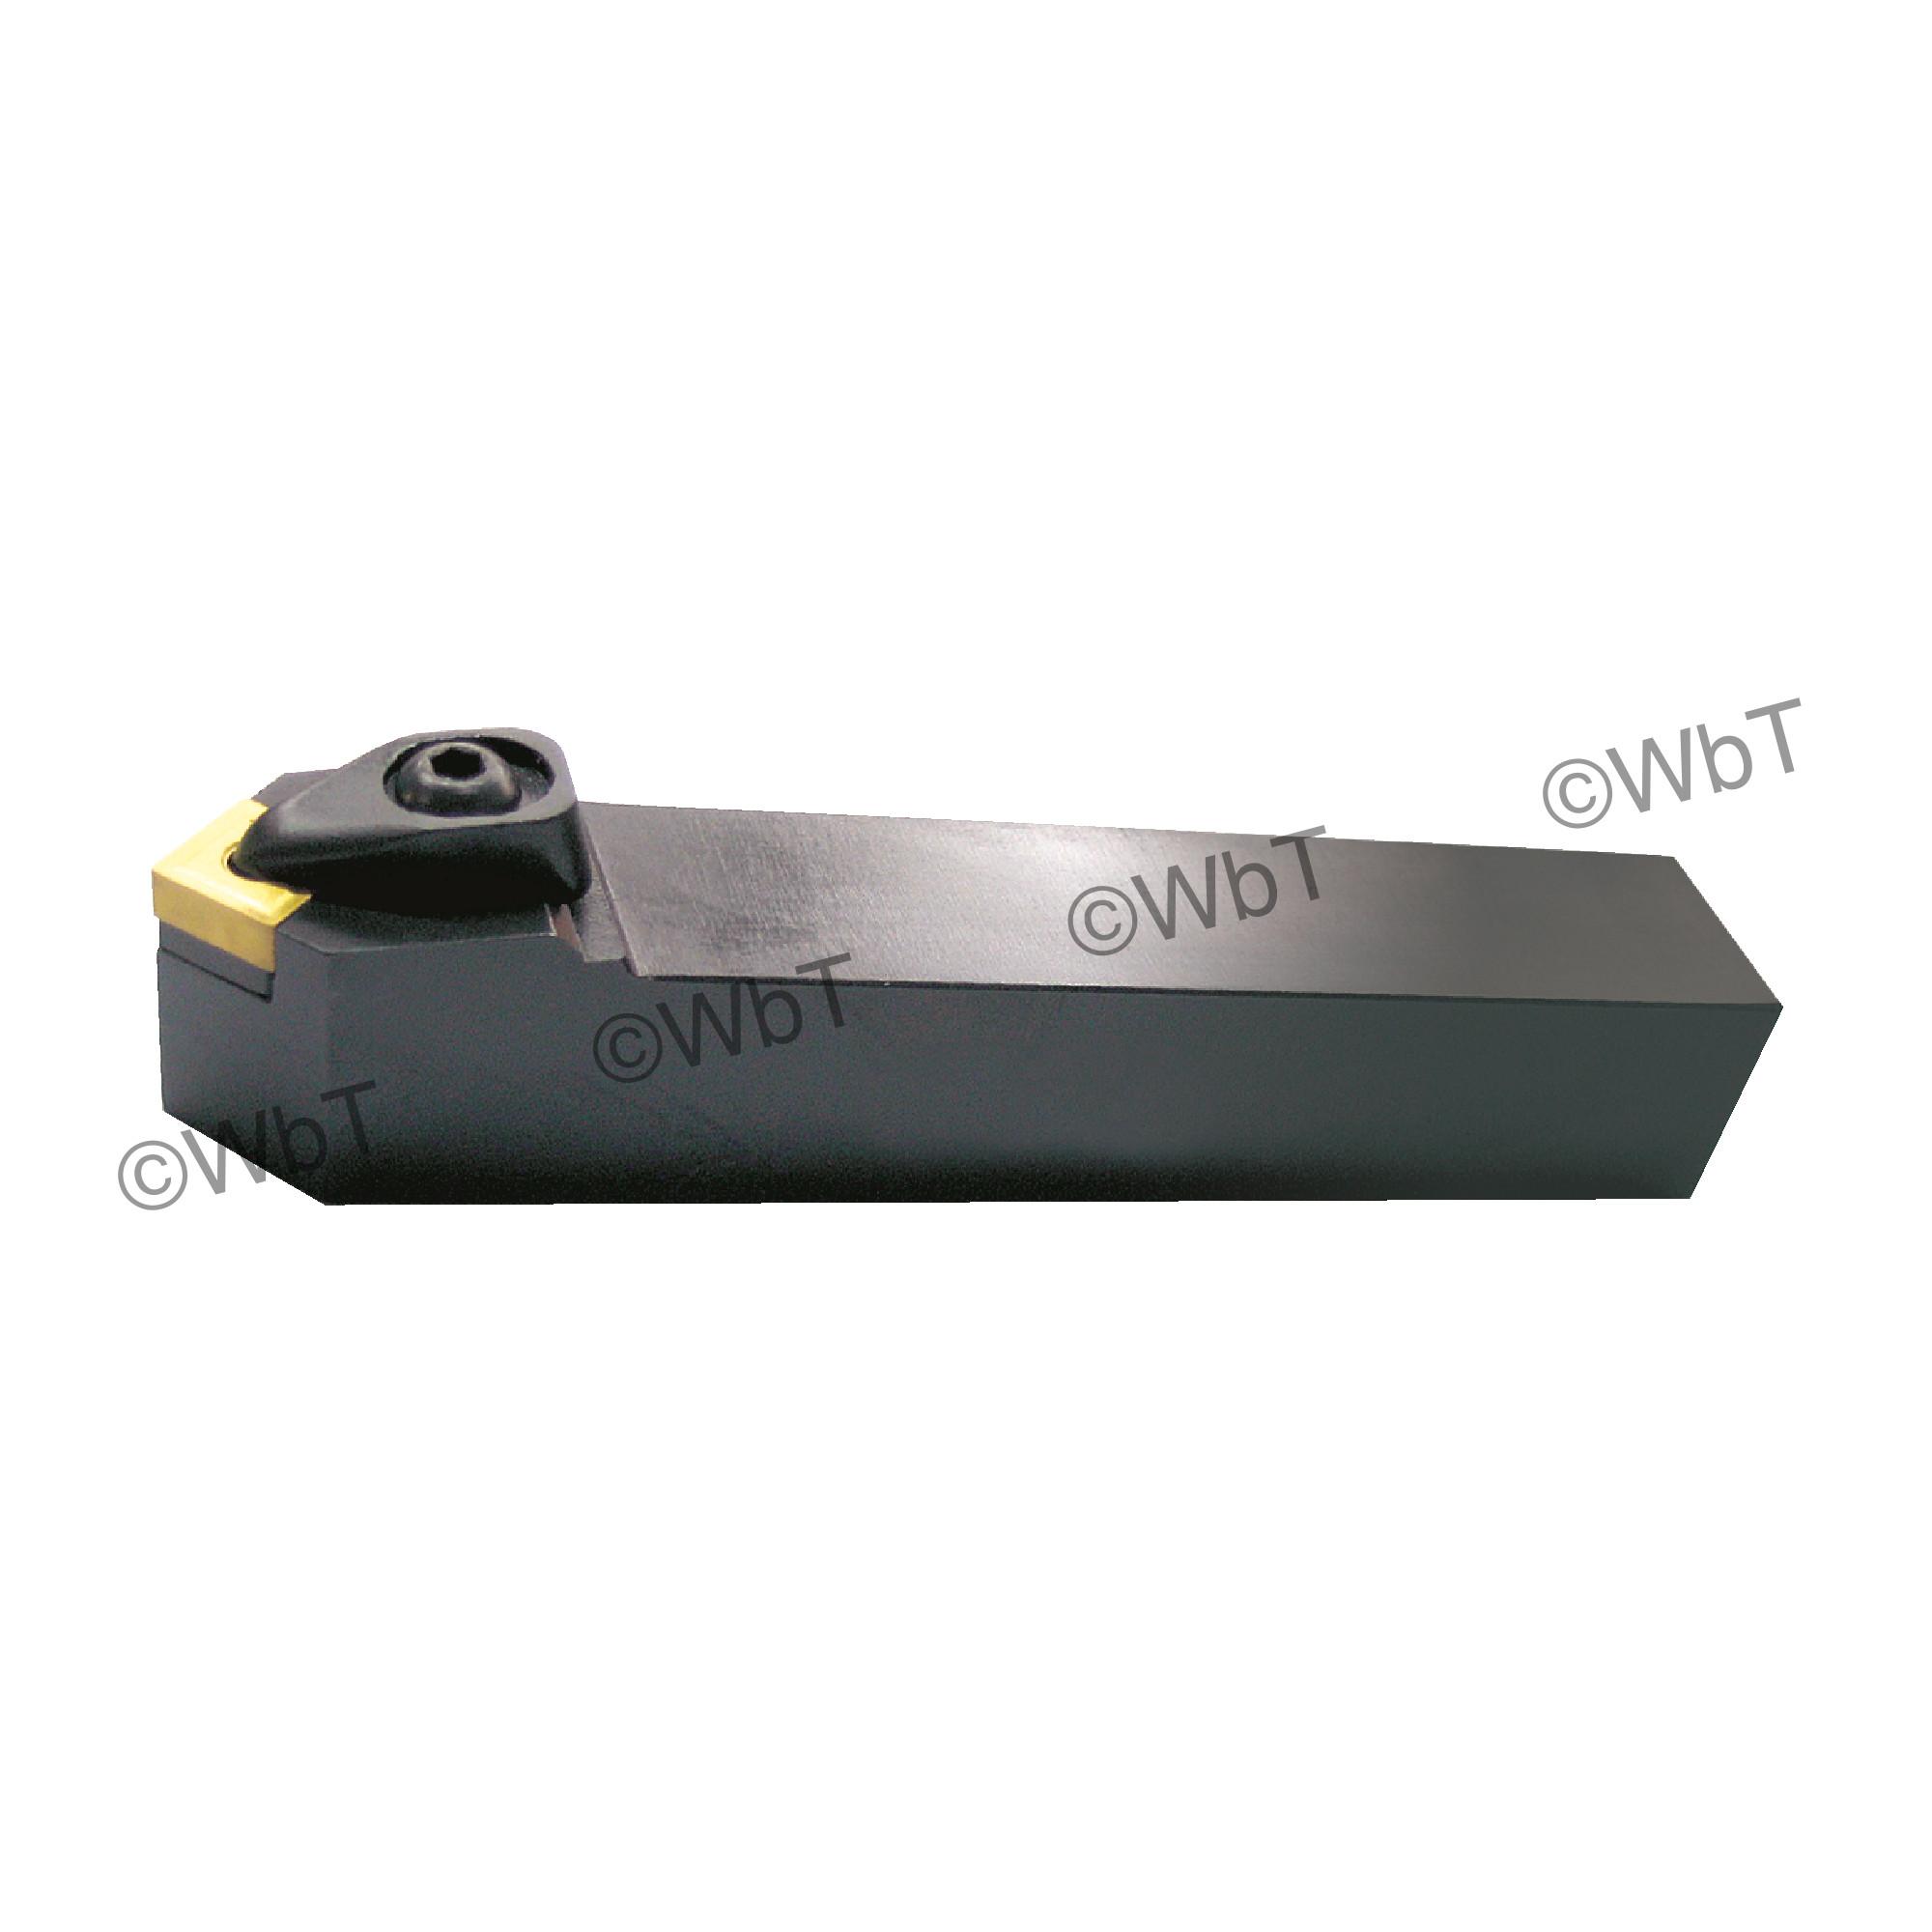 "TTC PRODUCTION - DSDNN12-4B / 0.750"" External Tool Holder for SNMG43_ Inserts / Neutral"